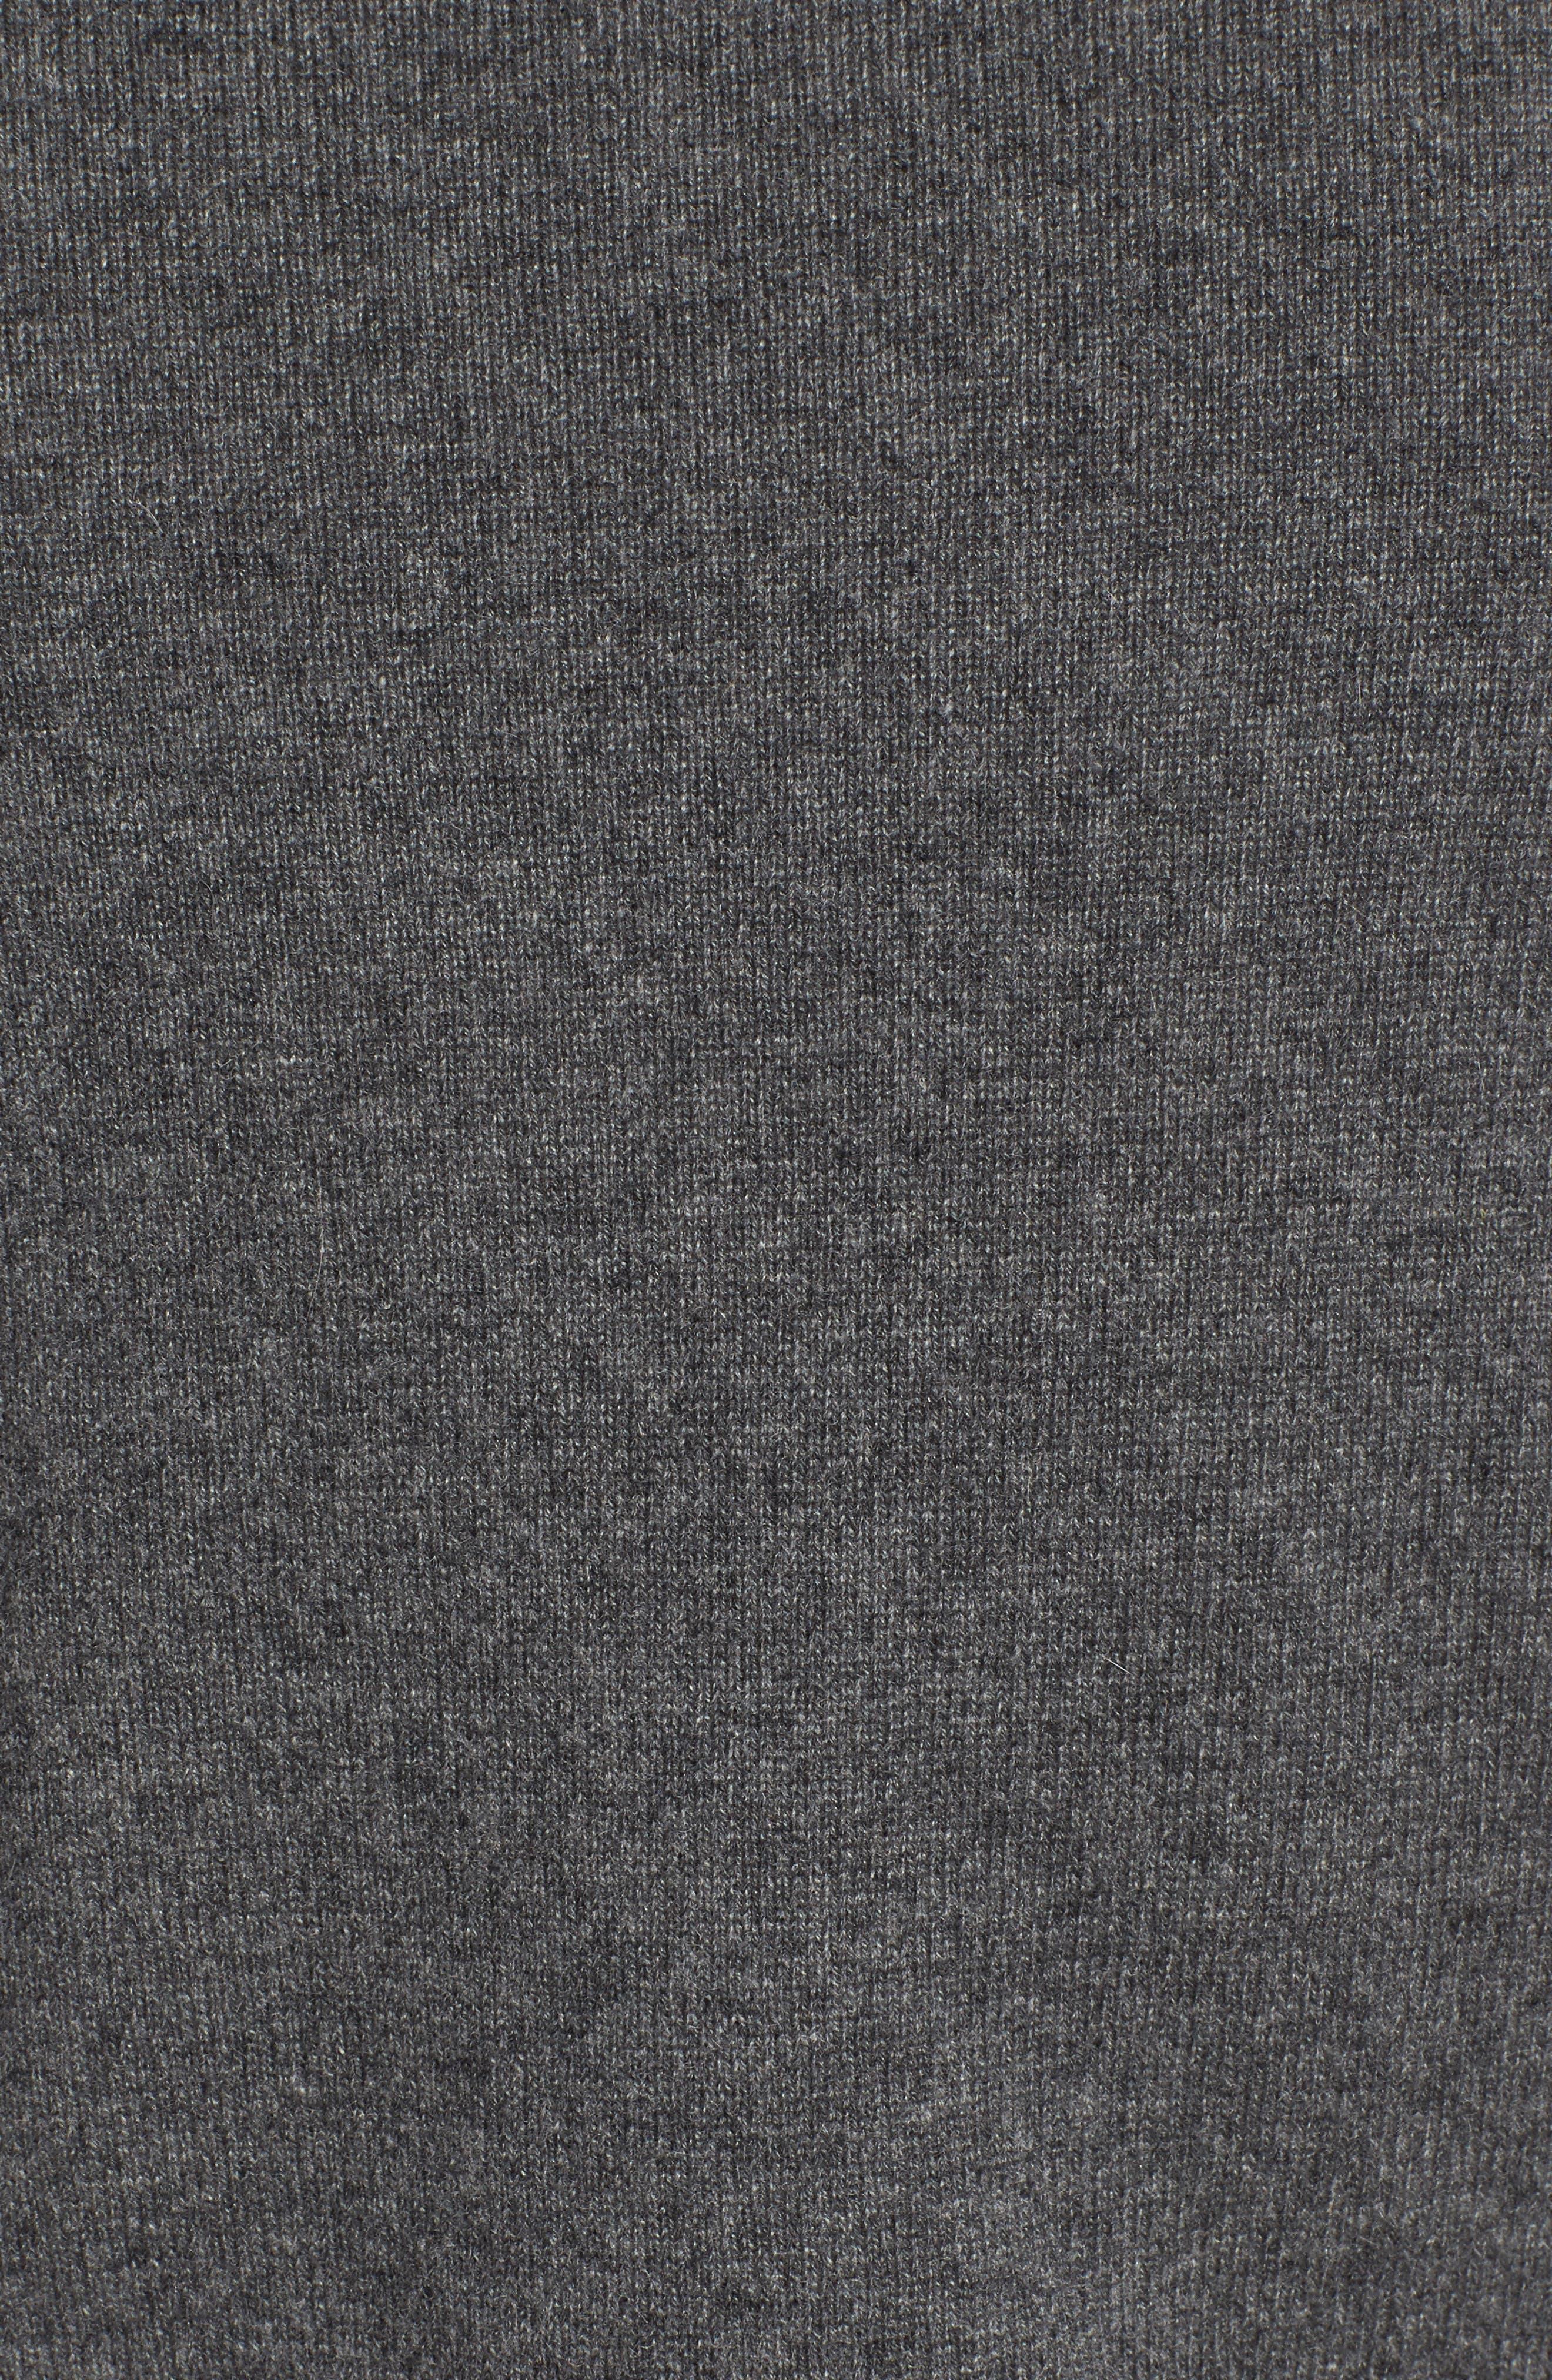 Camo Cashmere Sweater,                             Alternate thumbnail 5, color,                             Multi